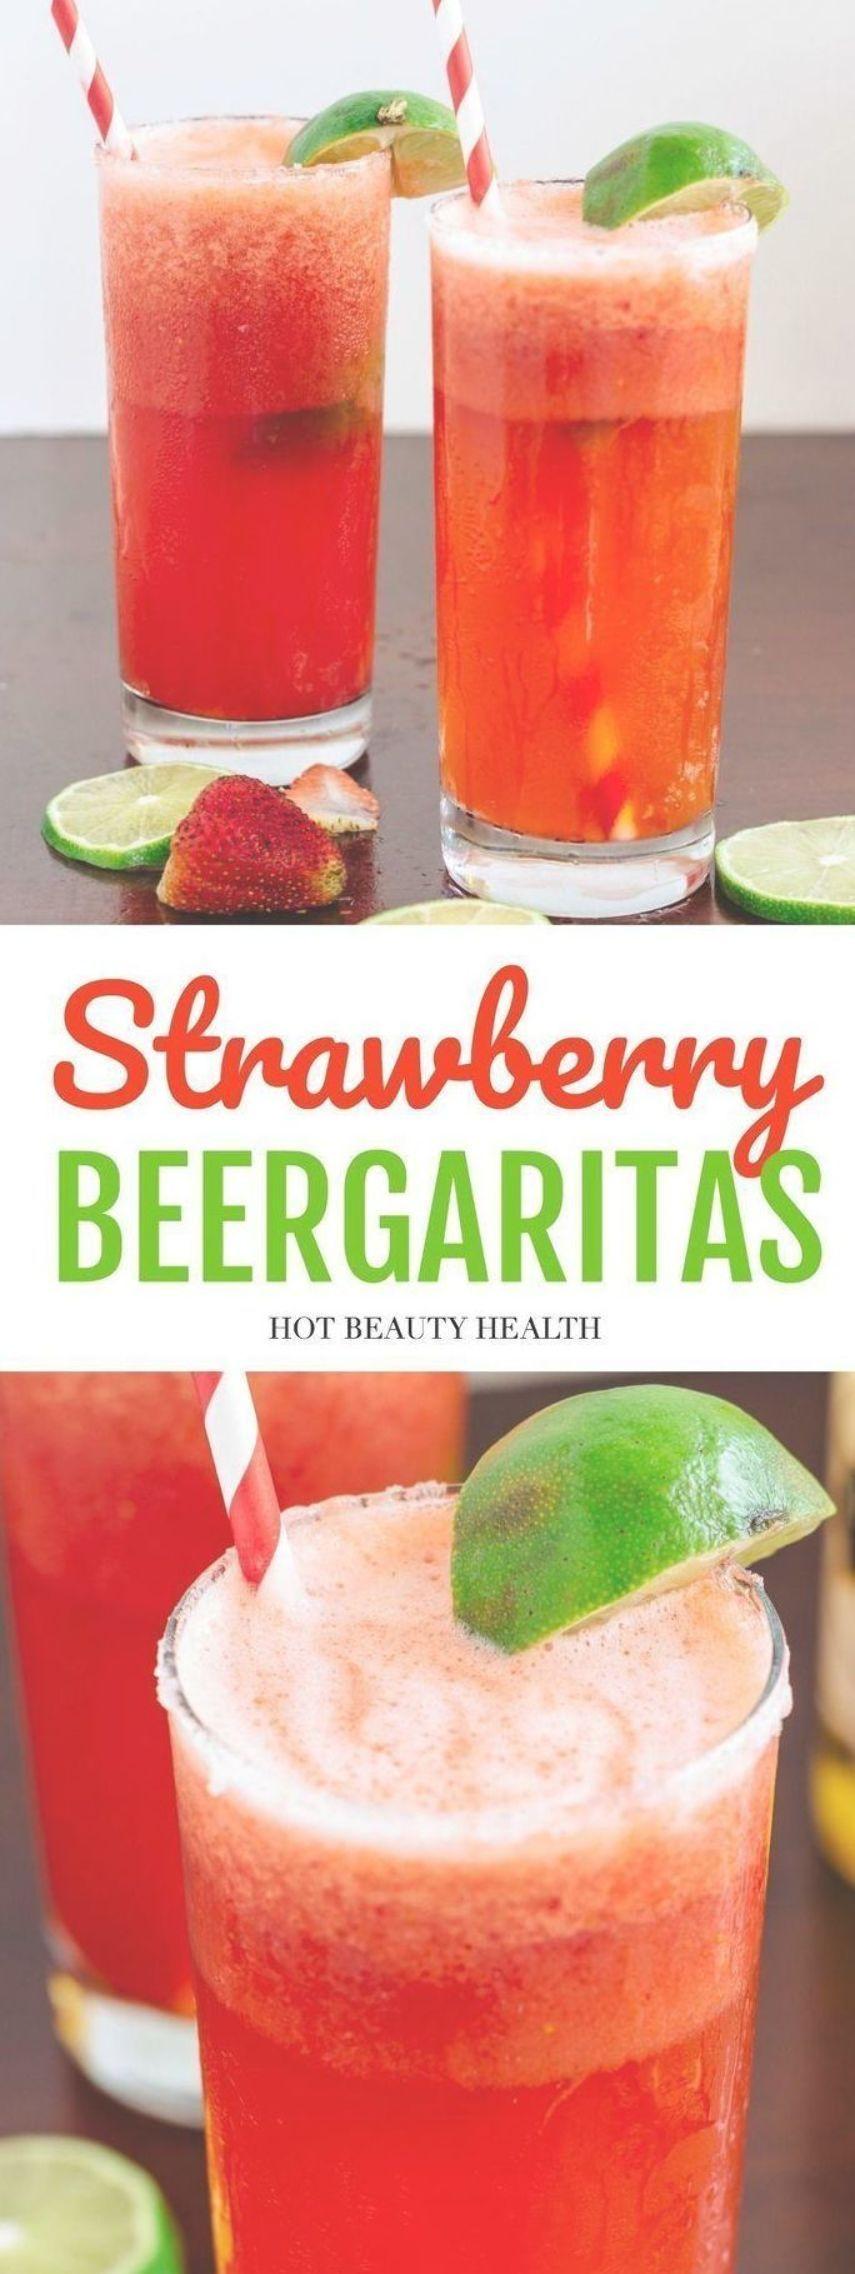 An Easy Strawberry Beer Margarita Recipe Made With Frozen Limeade 7up Estrella Jalisco Beer Strawberry Beer Strawberry Beer Margarita Recipe Beer Margarita